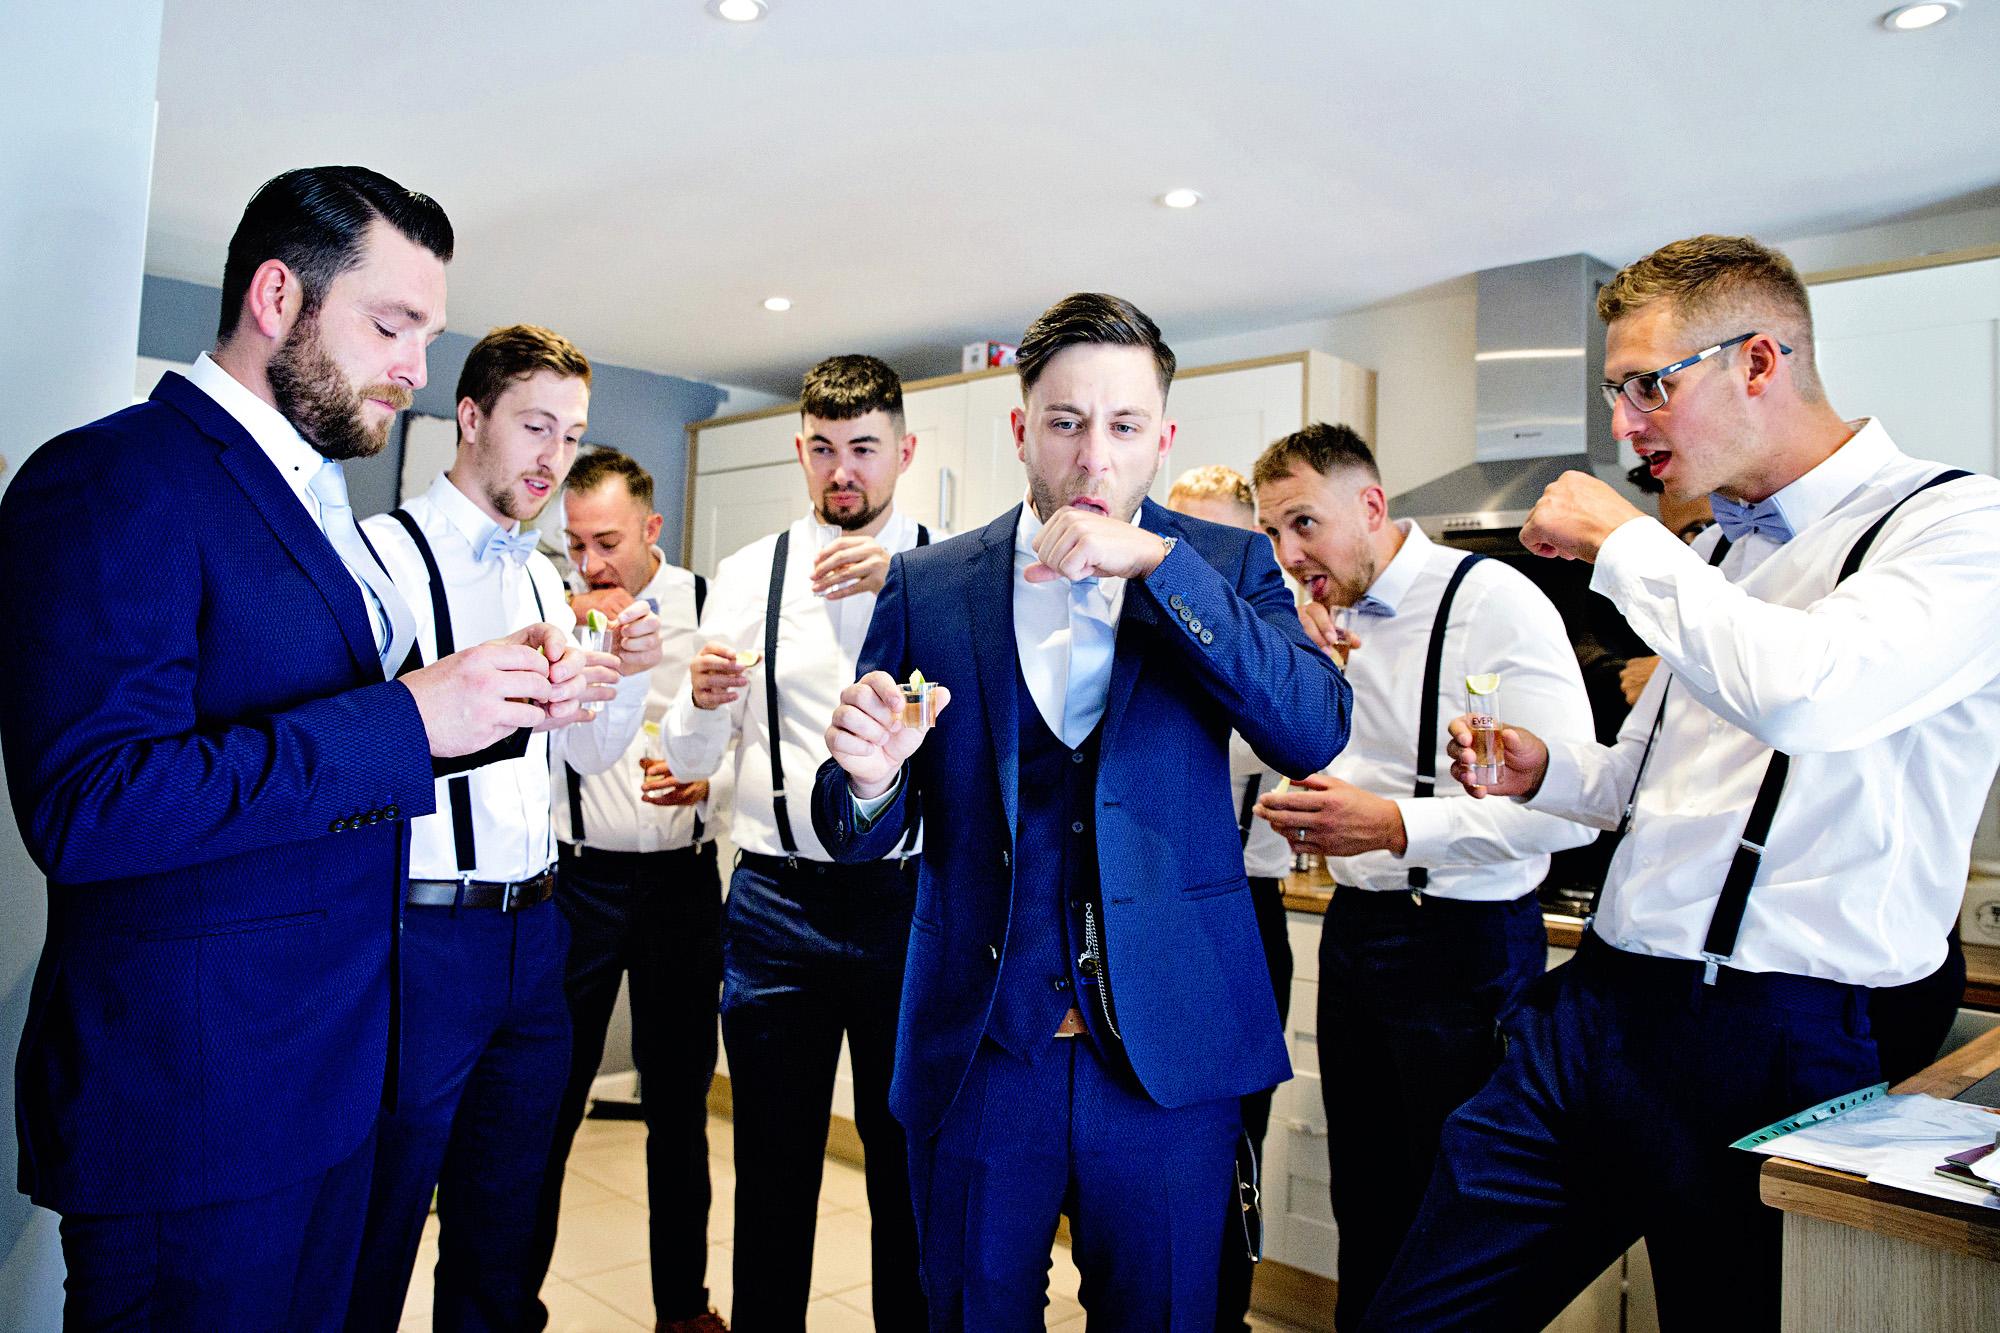 wedding-barnsdale-hall (8).jpg